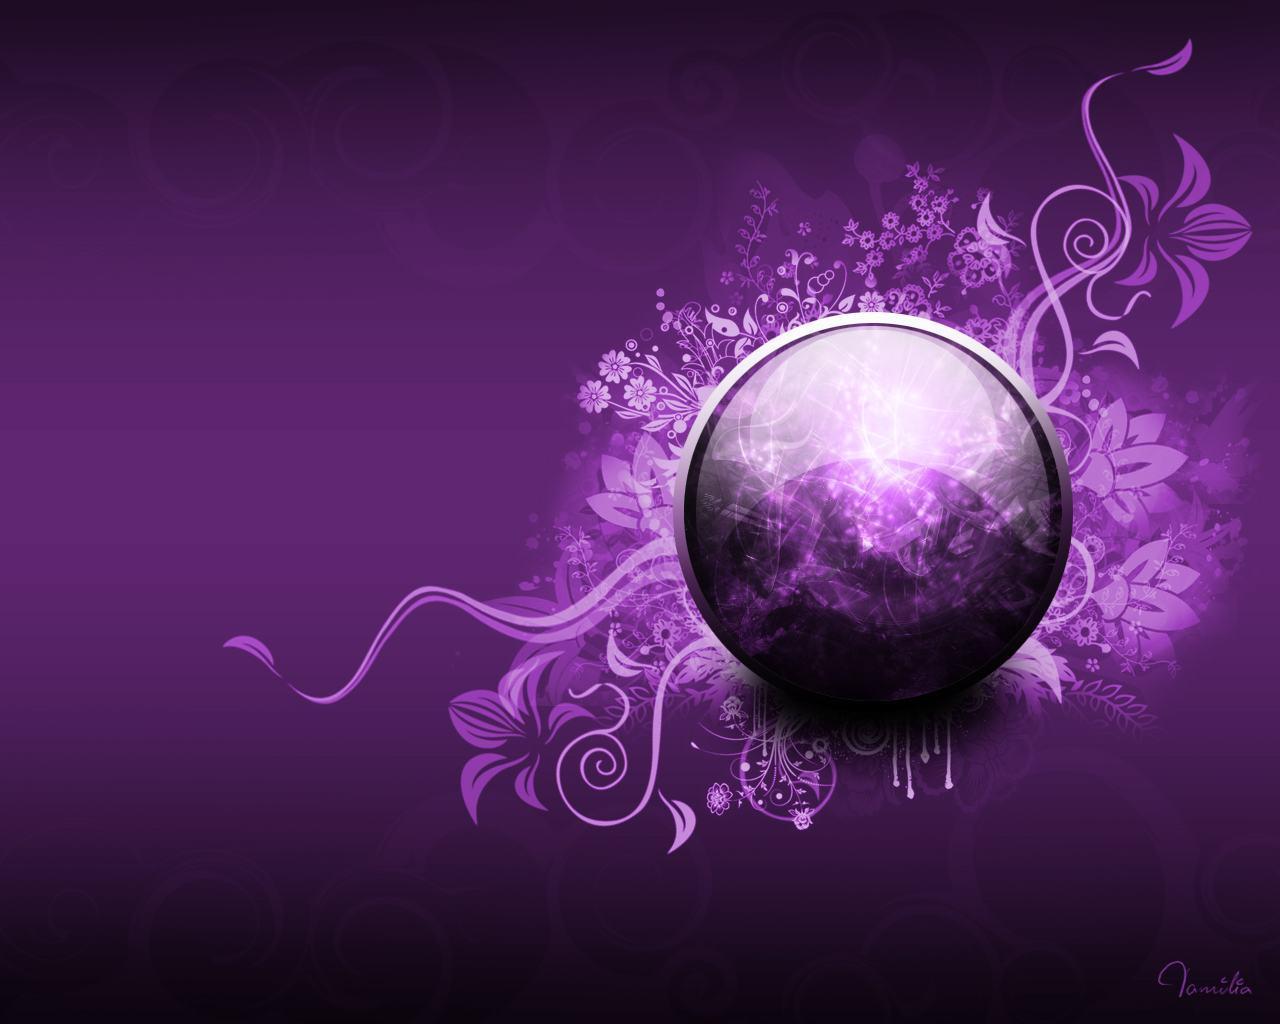 lavender background design - photo #11